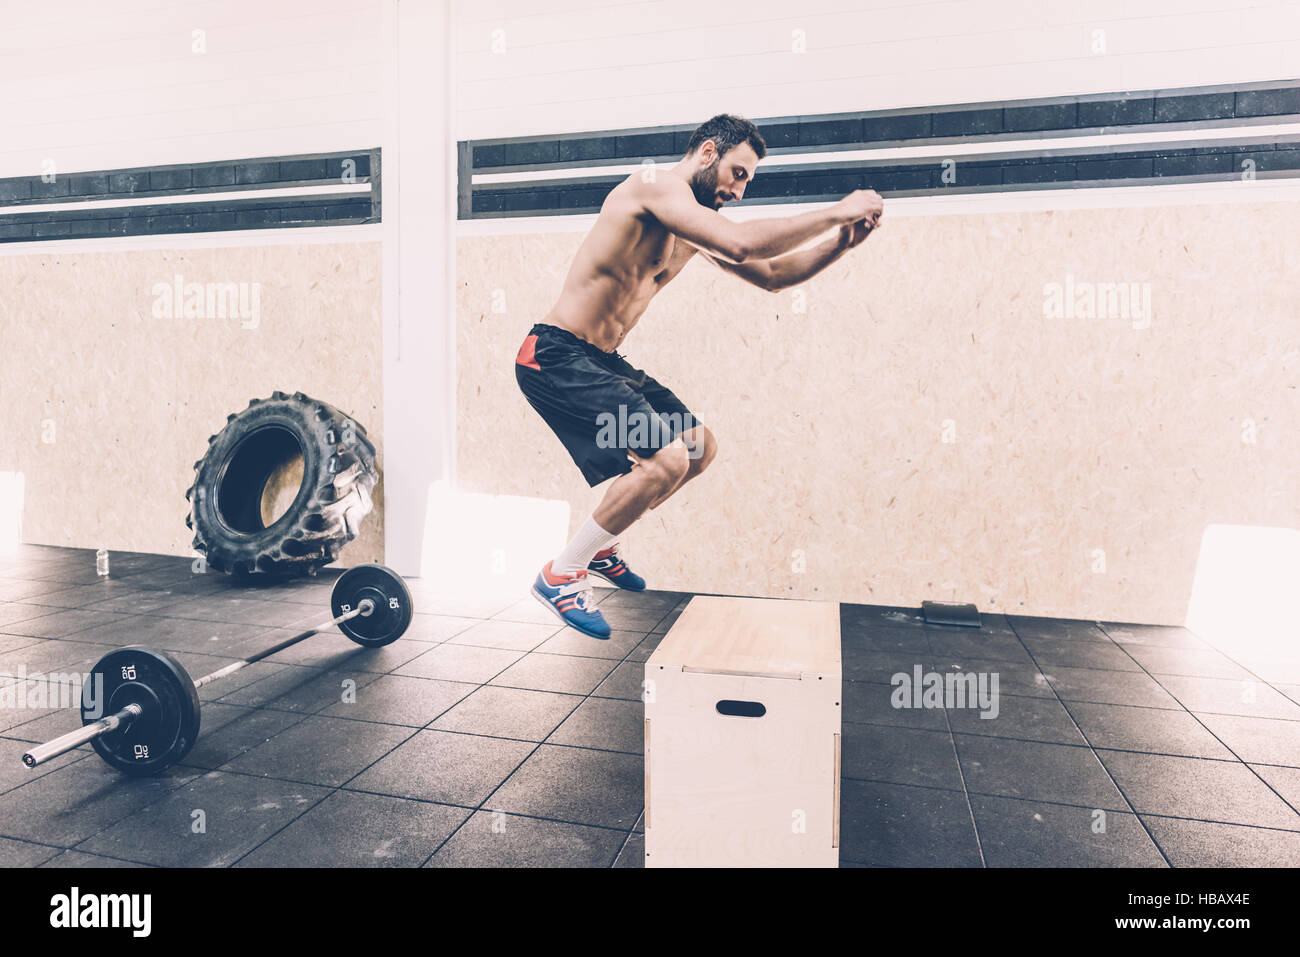 Joven saltando sobre verificación en cross training gimnasio Imagen De Stock